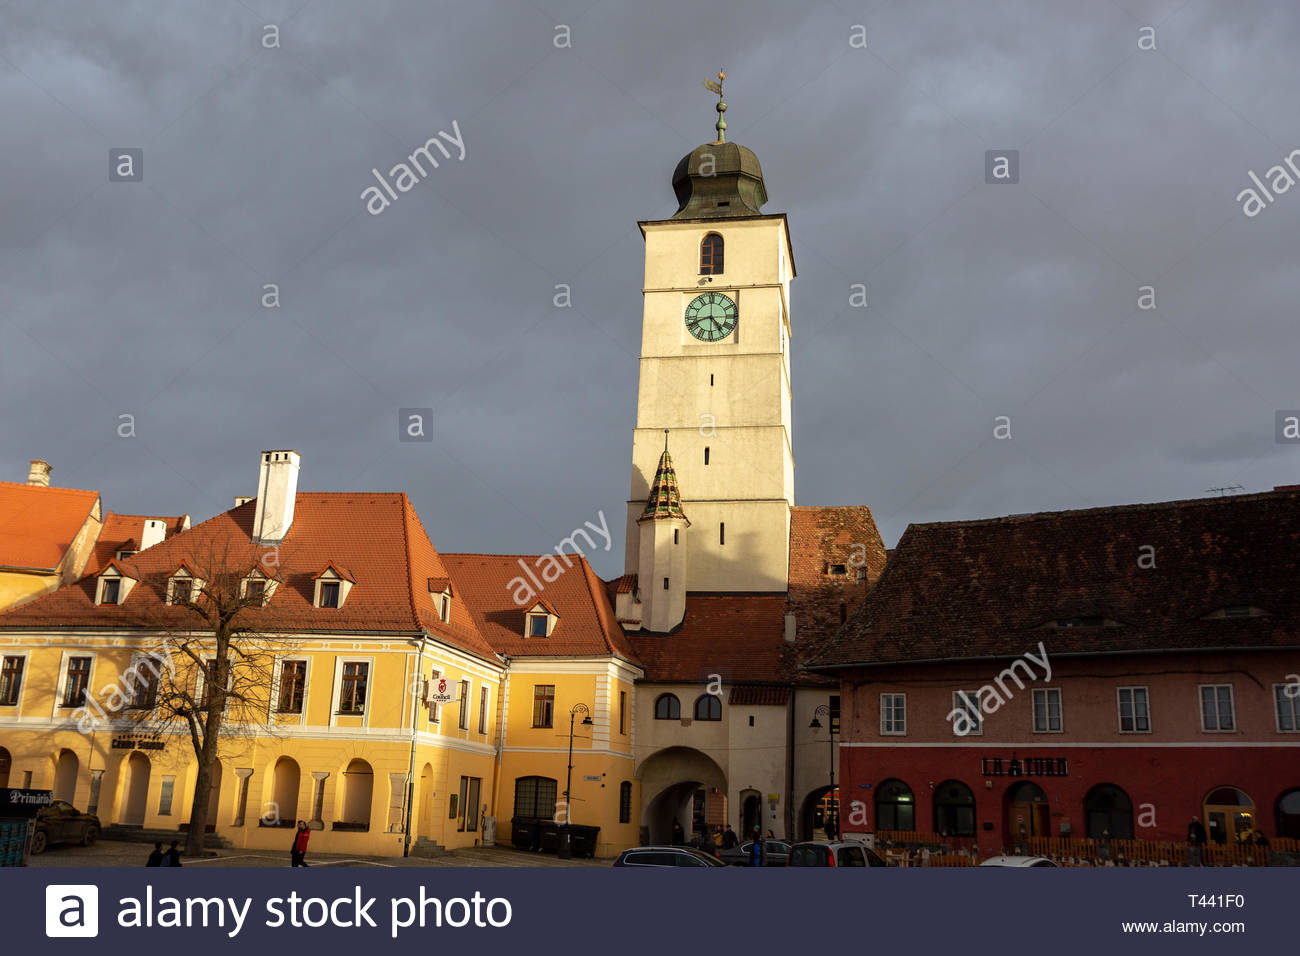 Sunlight Falls Across the Clock Tower of Cisnădiei Gate During Sunset - Sibiu, Romania - Stock Image